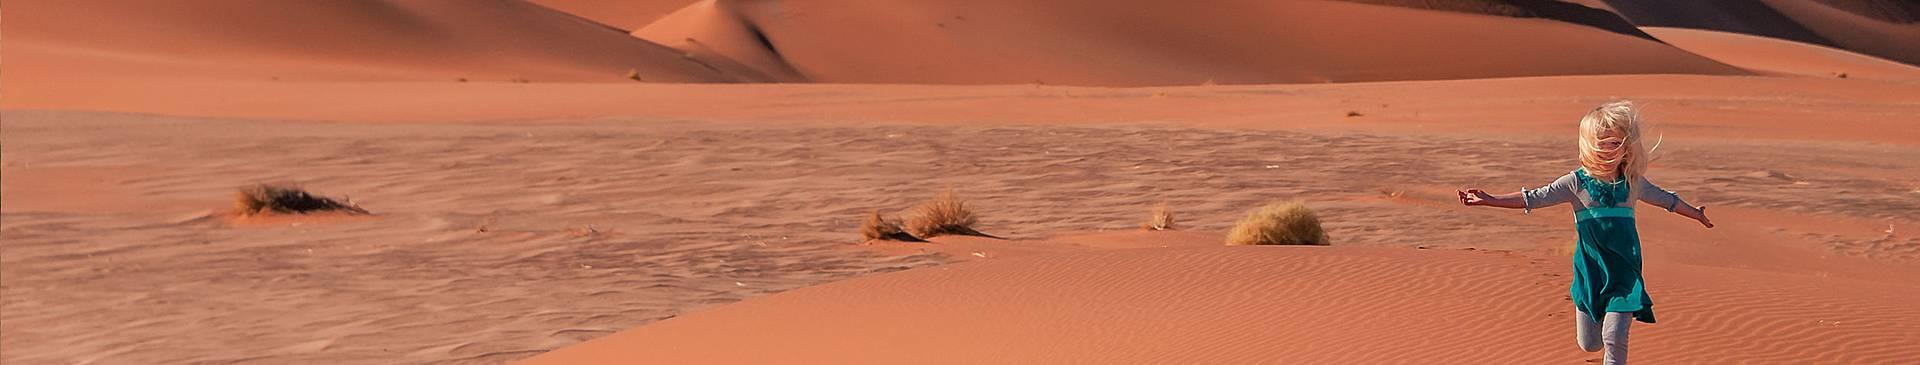 Voyage en Namibie avec enfants